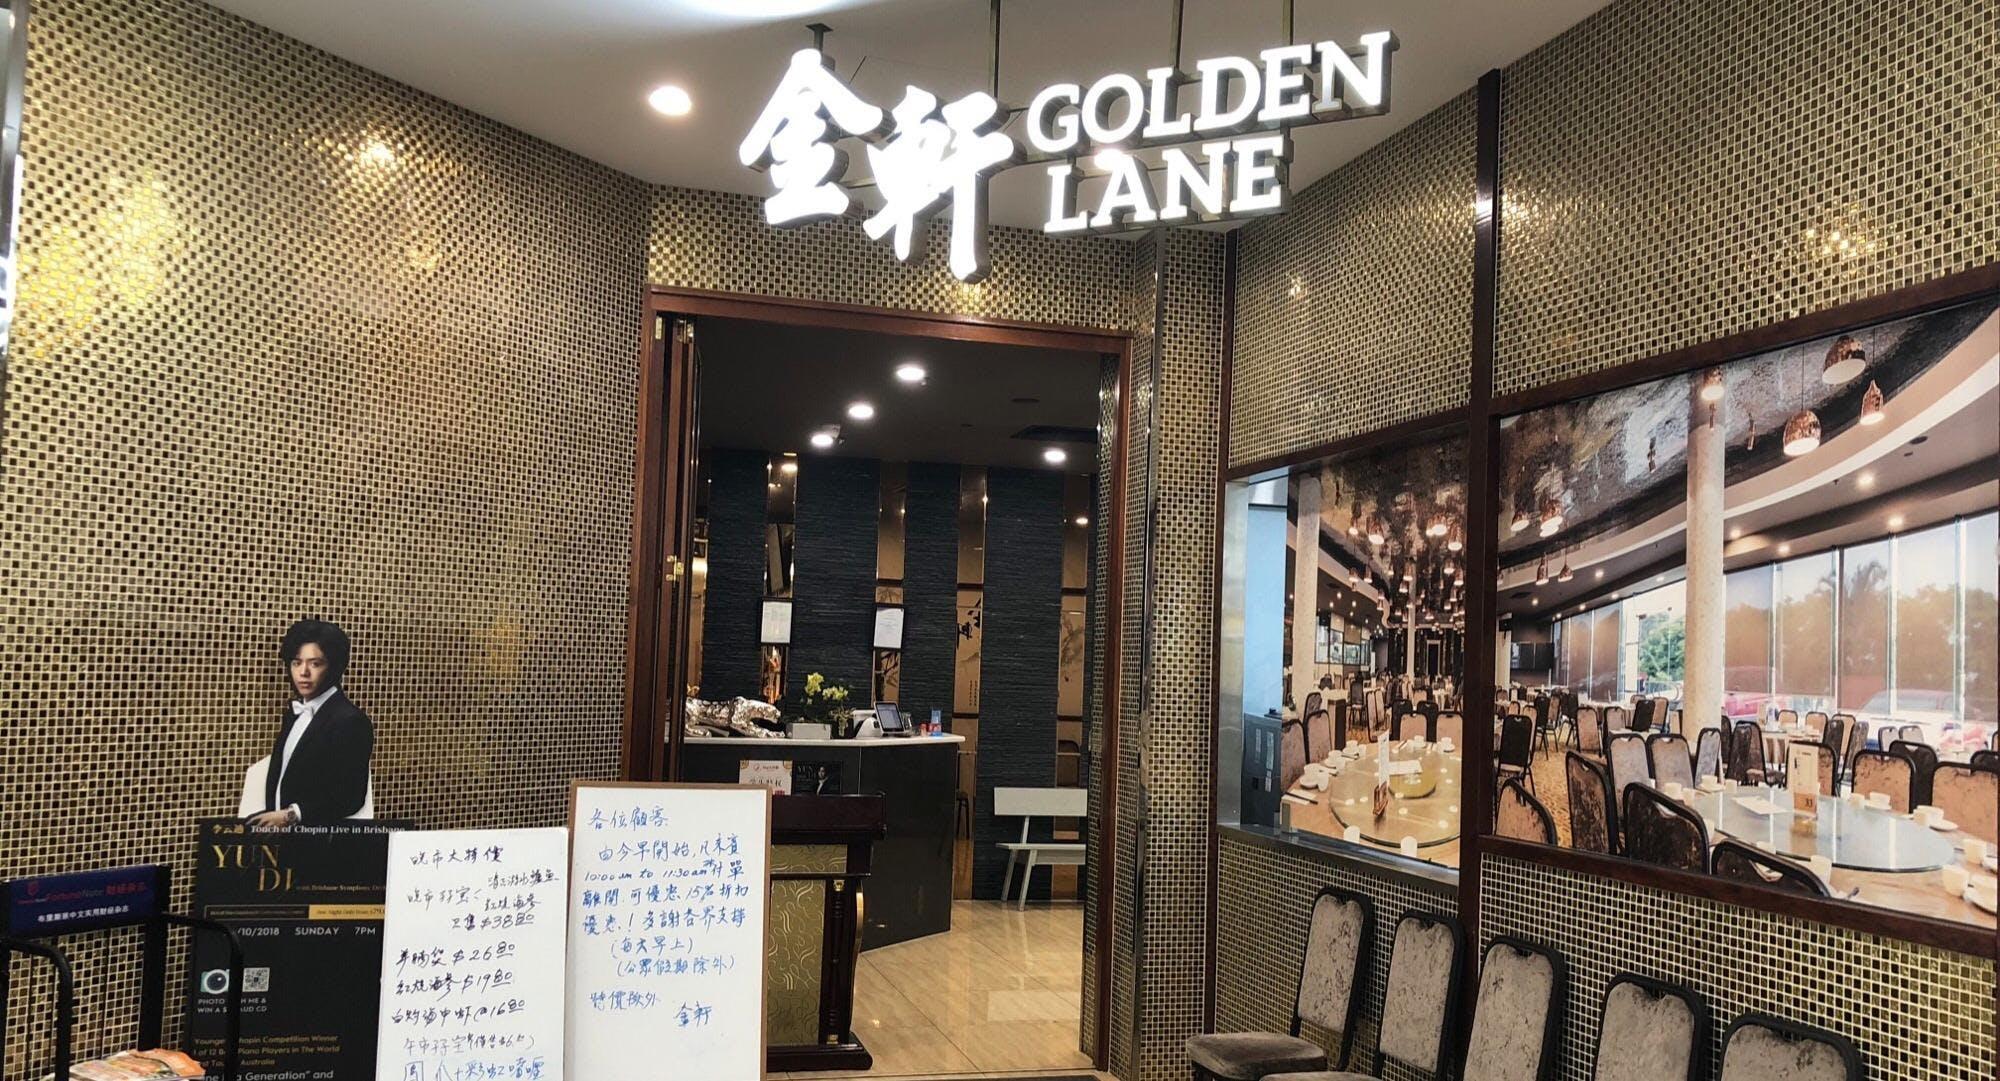 Golden Lane Brisbane image 2